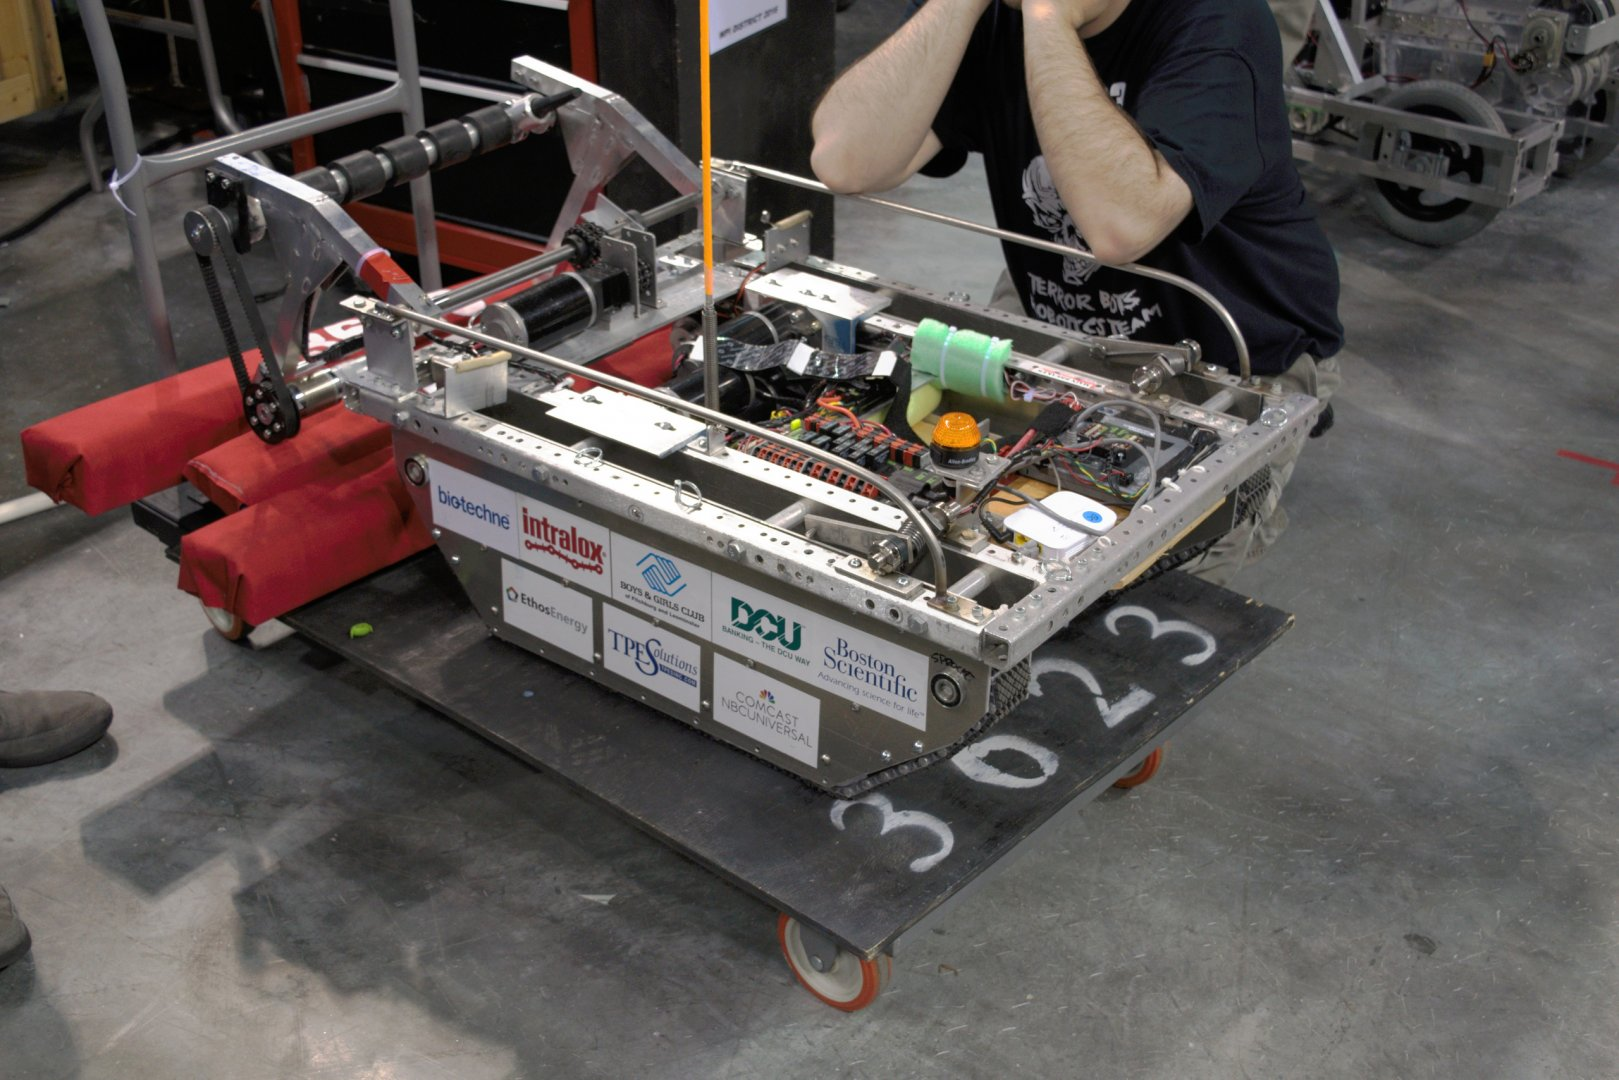 027.Boston FIRST Robotics Competition 04-03-2016.jpg